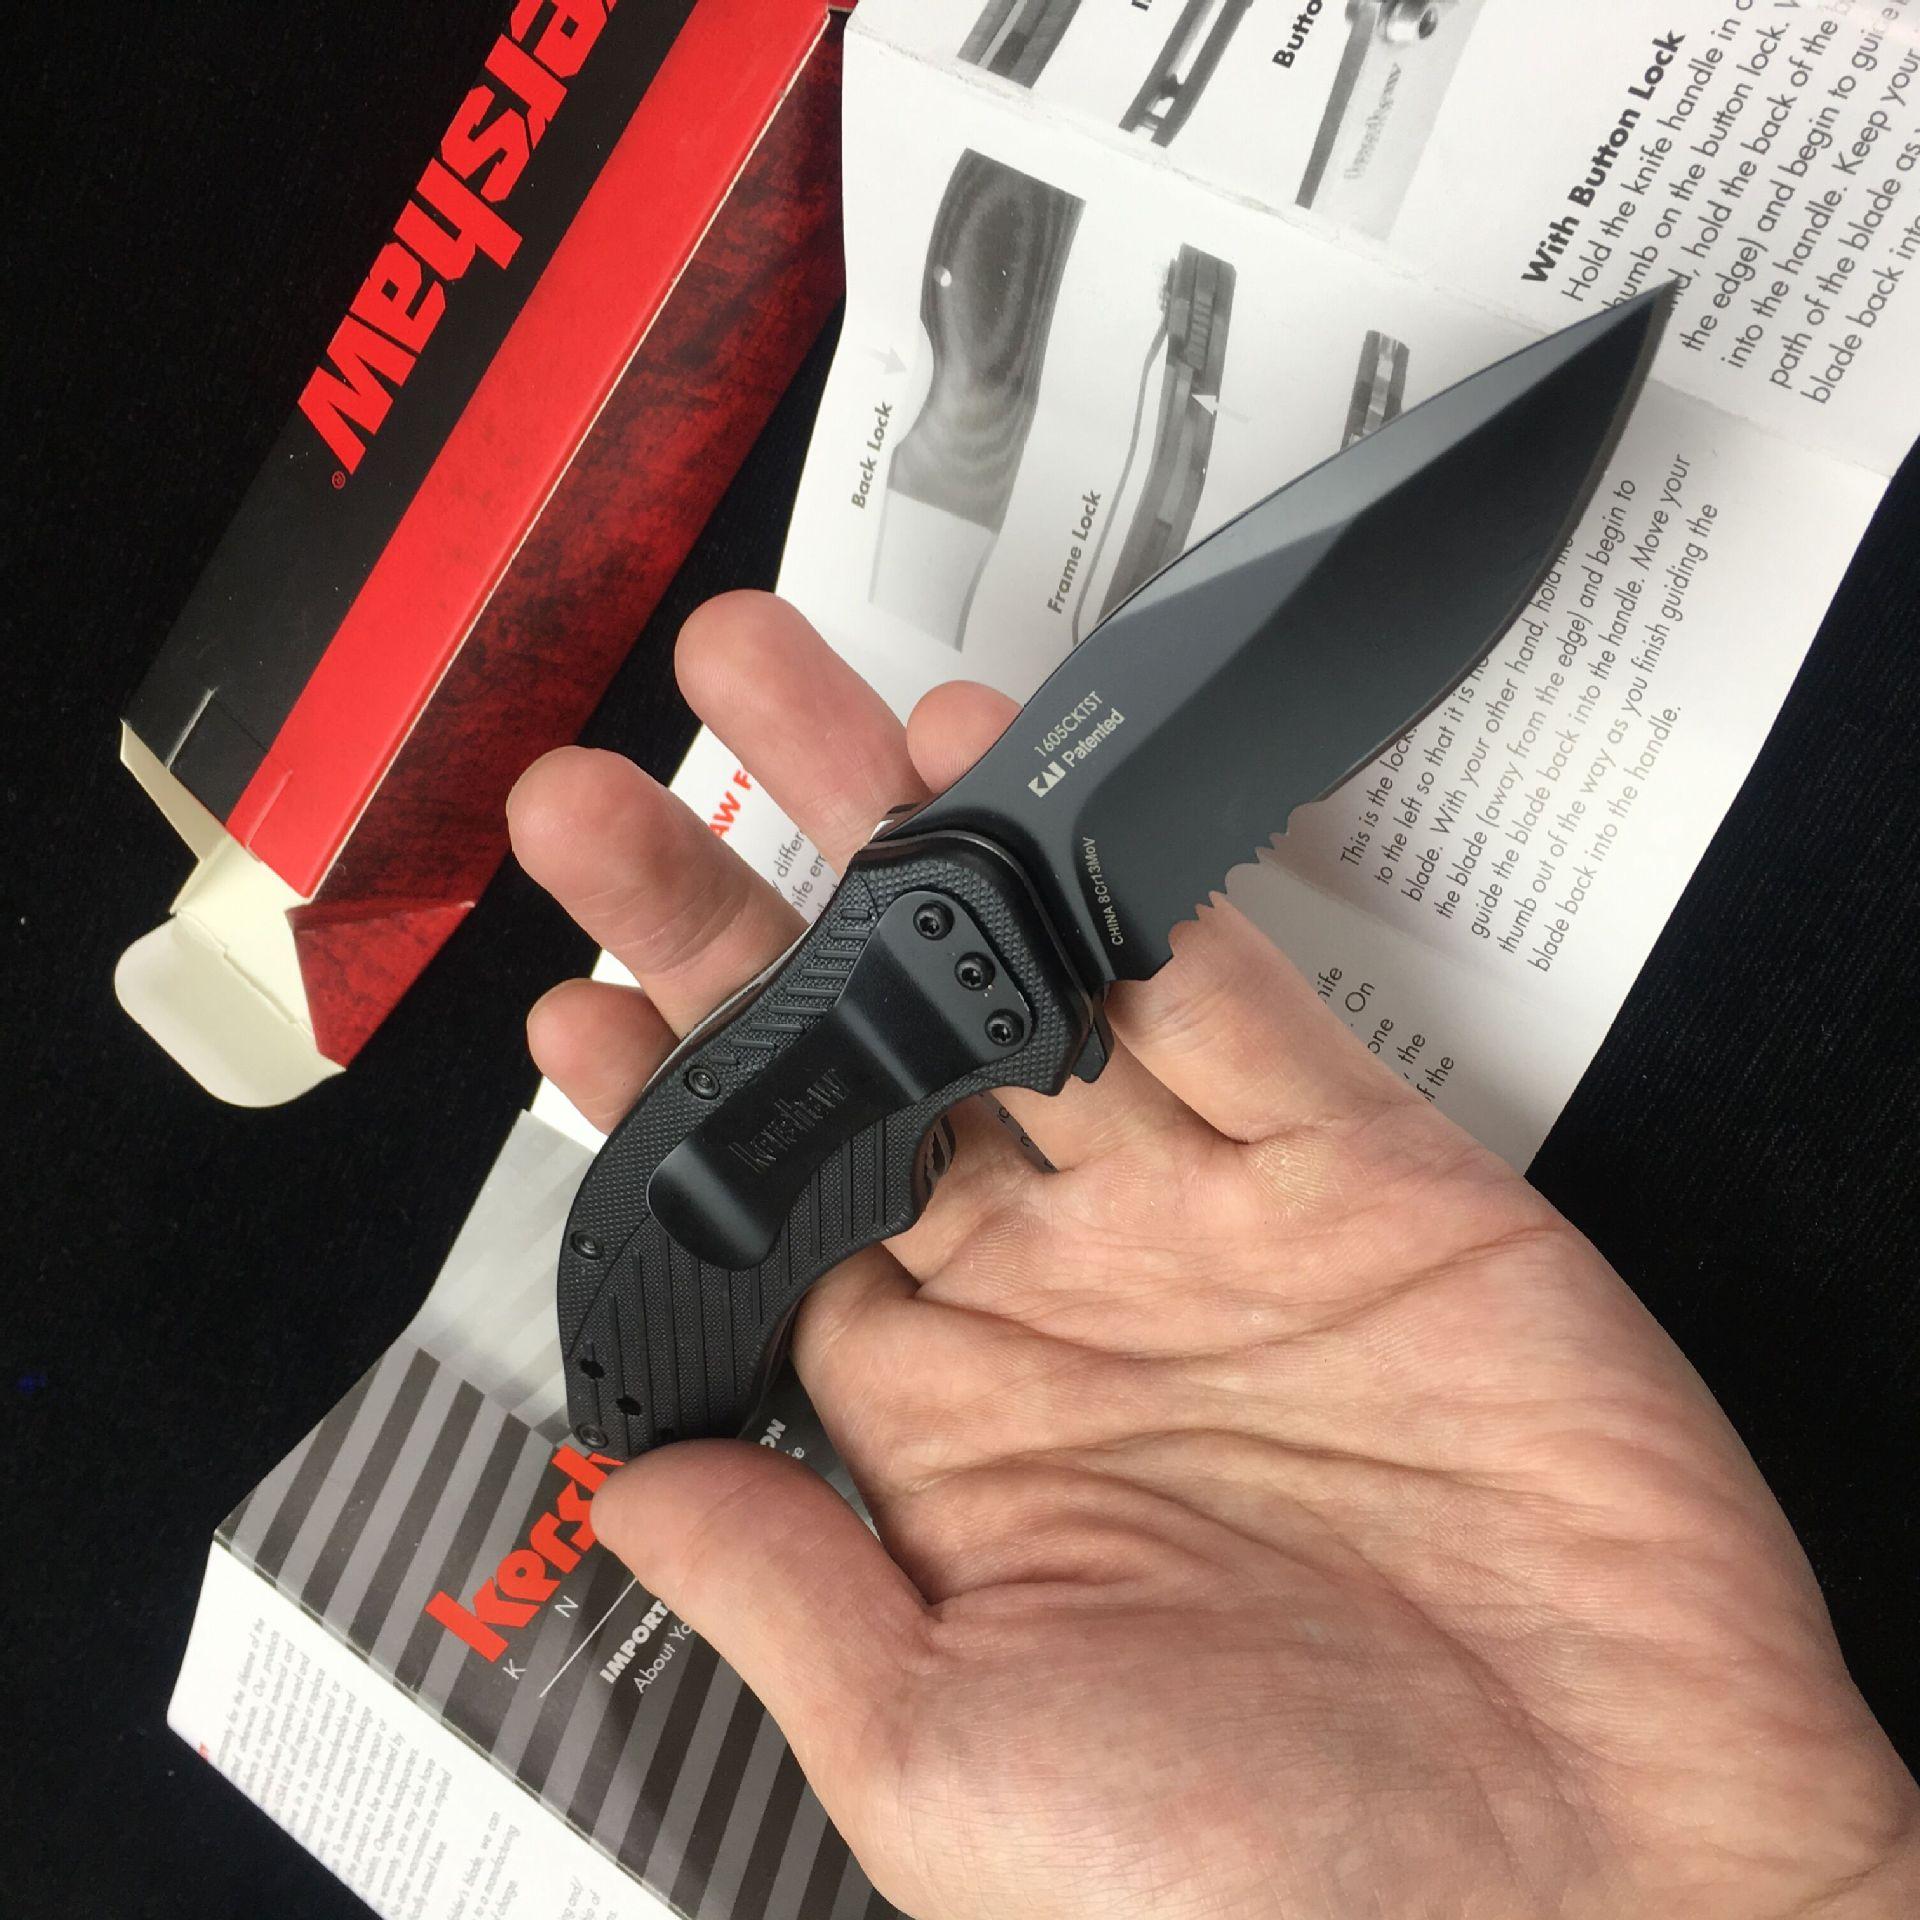 K 1605 Folding Pocket Outdoor Camping Hunt Knife 8CR13MOV Blade G10 Handle Tactical Survival Utility Fruit Knives EDC Tool